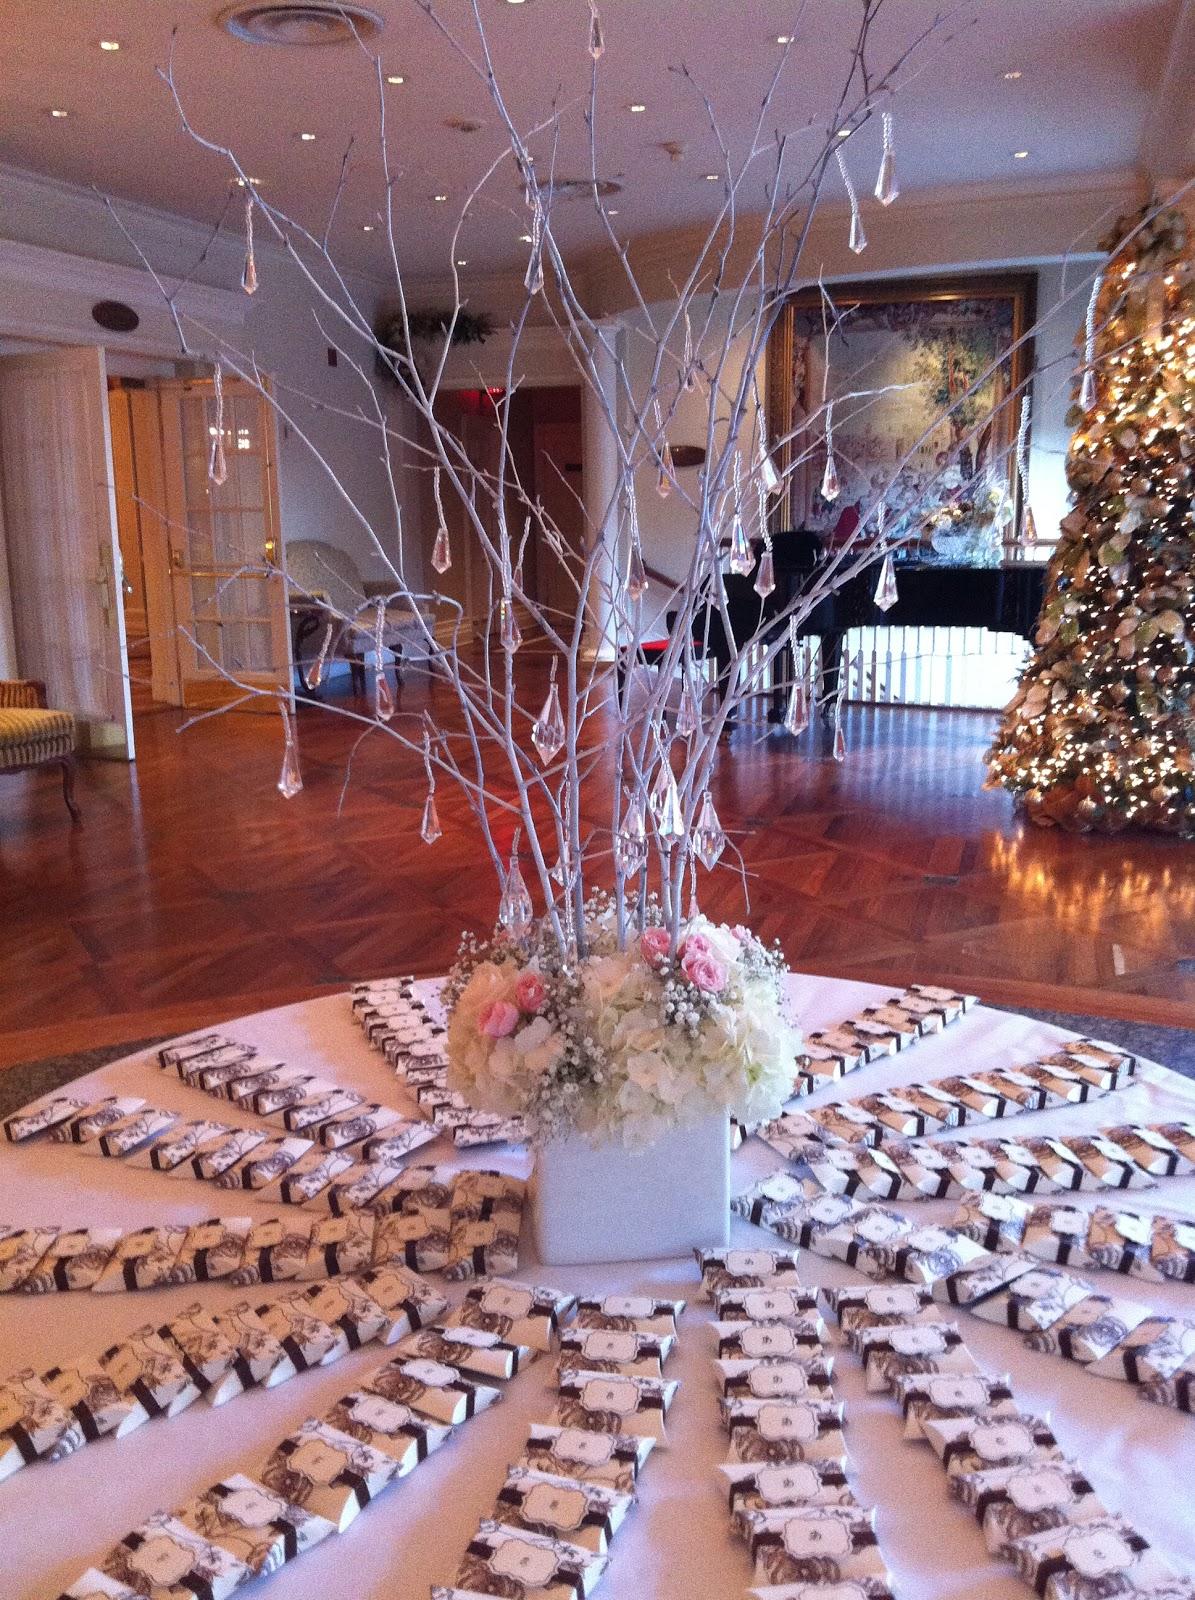 Cool winter wonderland table decorations